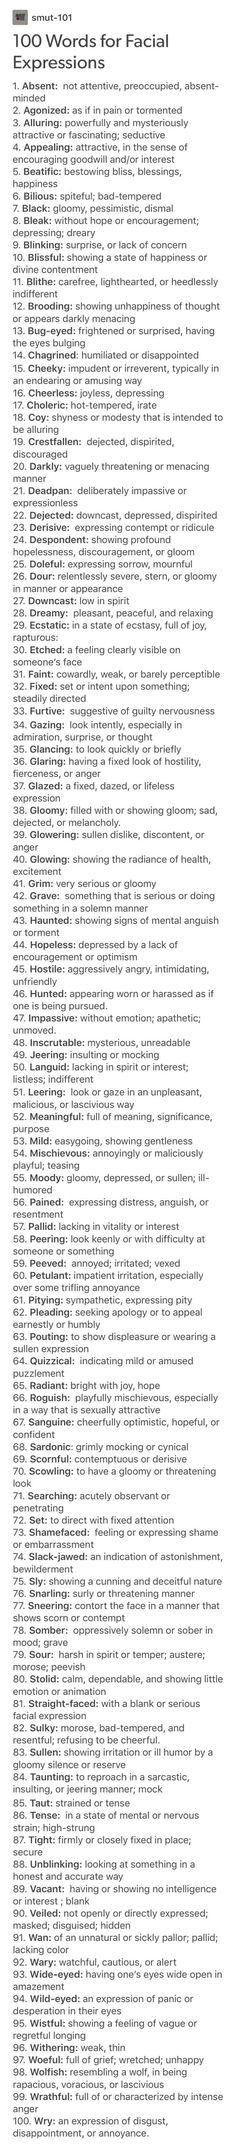 Feelings/ facial expressions